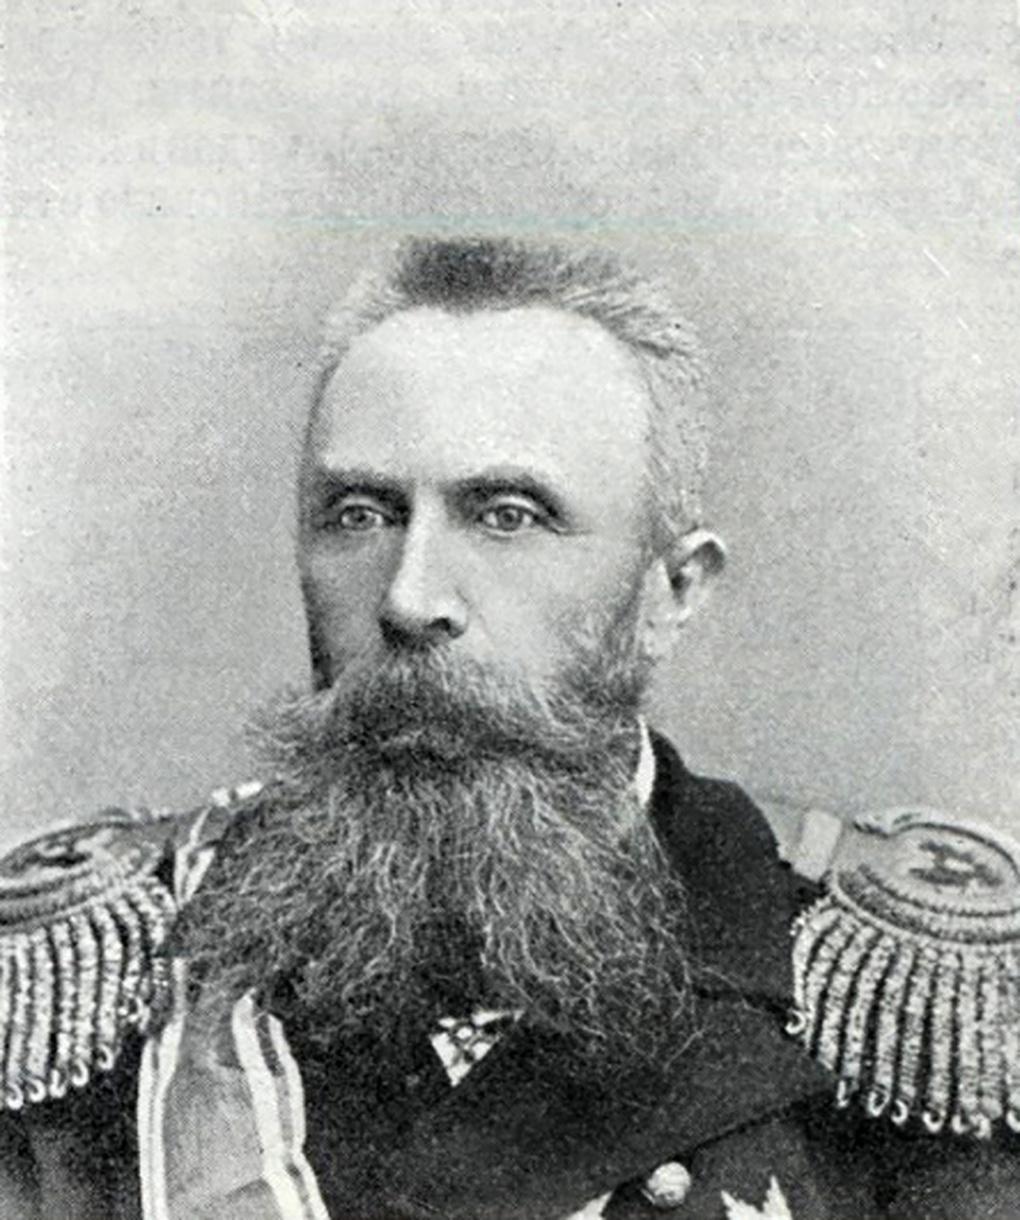 Вице-адмирал О.В.Старк.